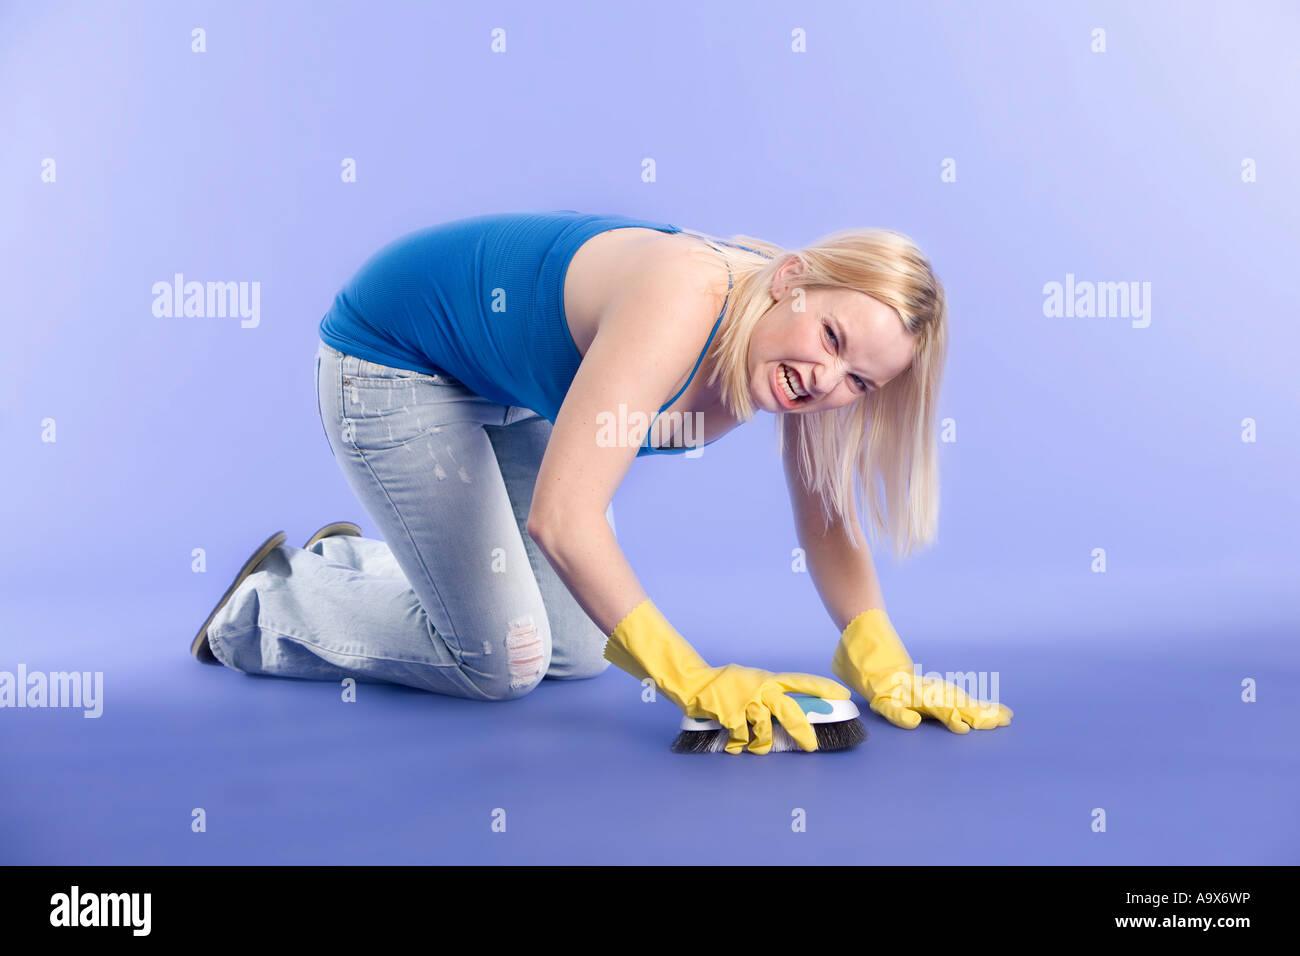 young woman scrubbing a floor unhappily - Stock Image